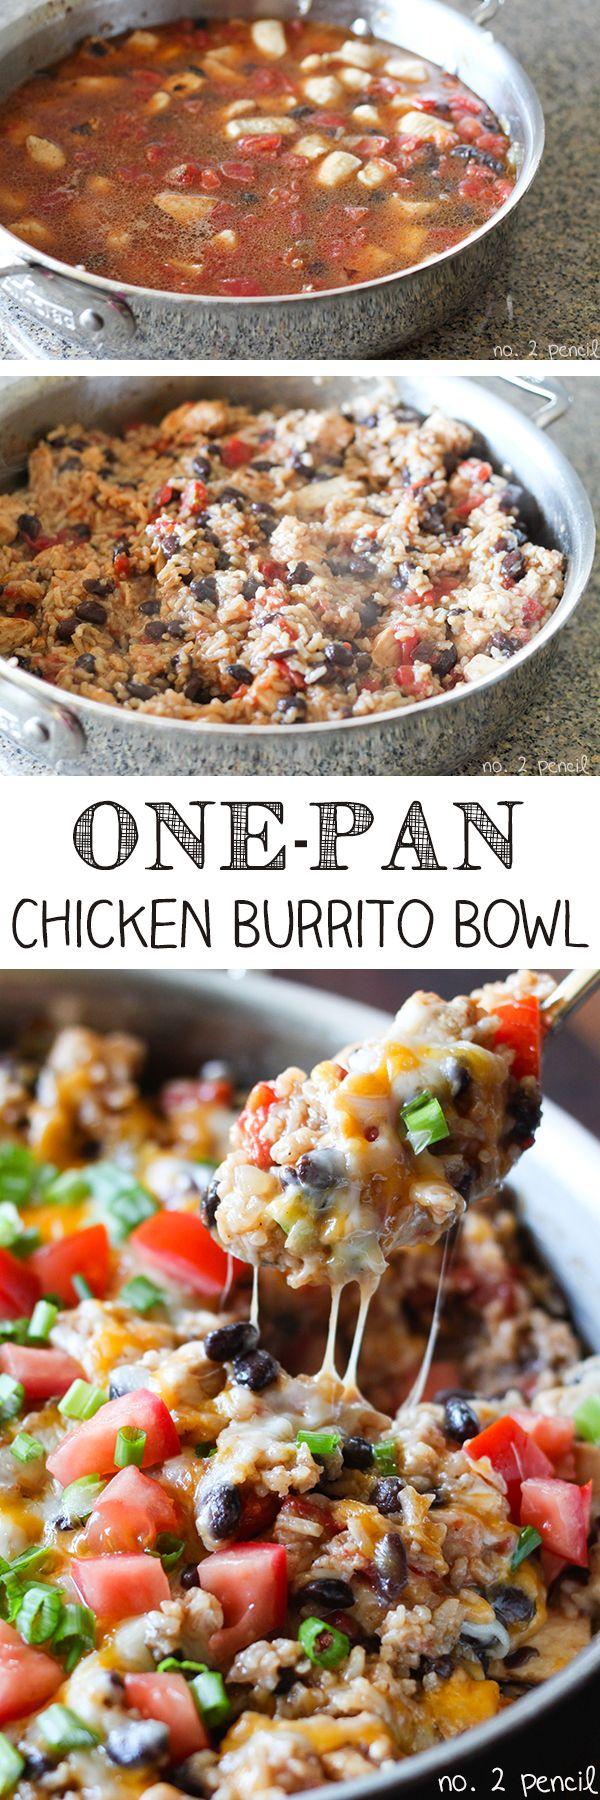 One-Pan Chicken Burrito Bowl Recipe